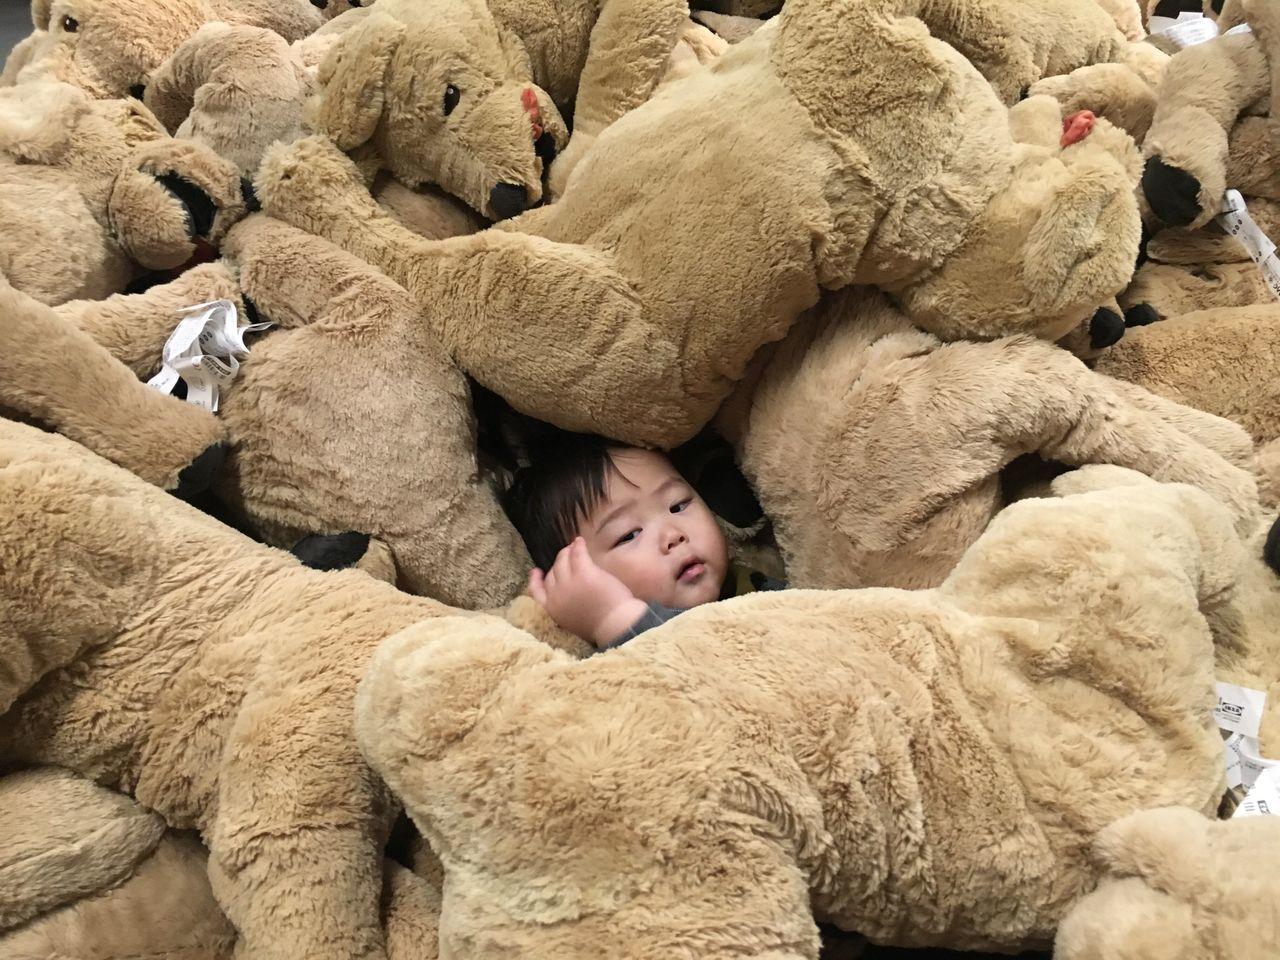 Baby 사진 Suri Snap Photo 스냅 스냅사진 강아지 인형 이케아 IKEA Doll Dogs 설정샷 Gwangmyeong, Korea The Street Photographer The Street Photographer - 2017 EyeEm Awards